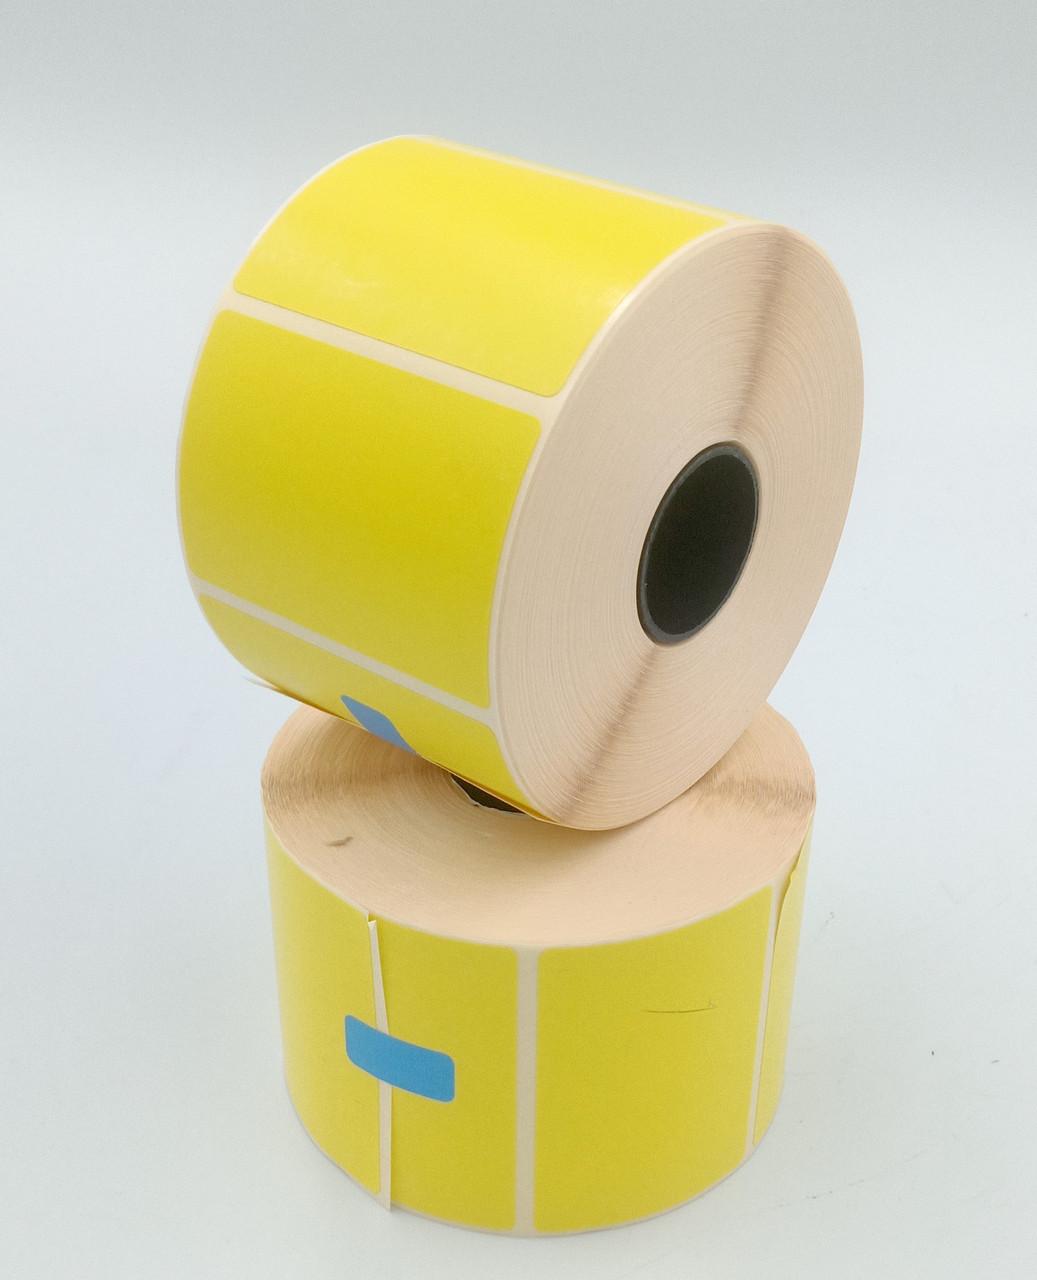 Термоетикетка Т. Еко пантон 58*40 мм 1000 етикеток прямокутна 5 шт жовта (5840T1000V25Y)